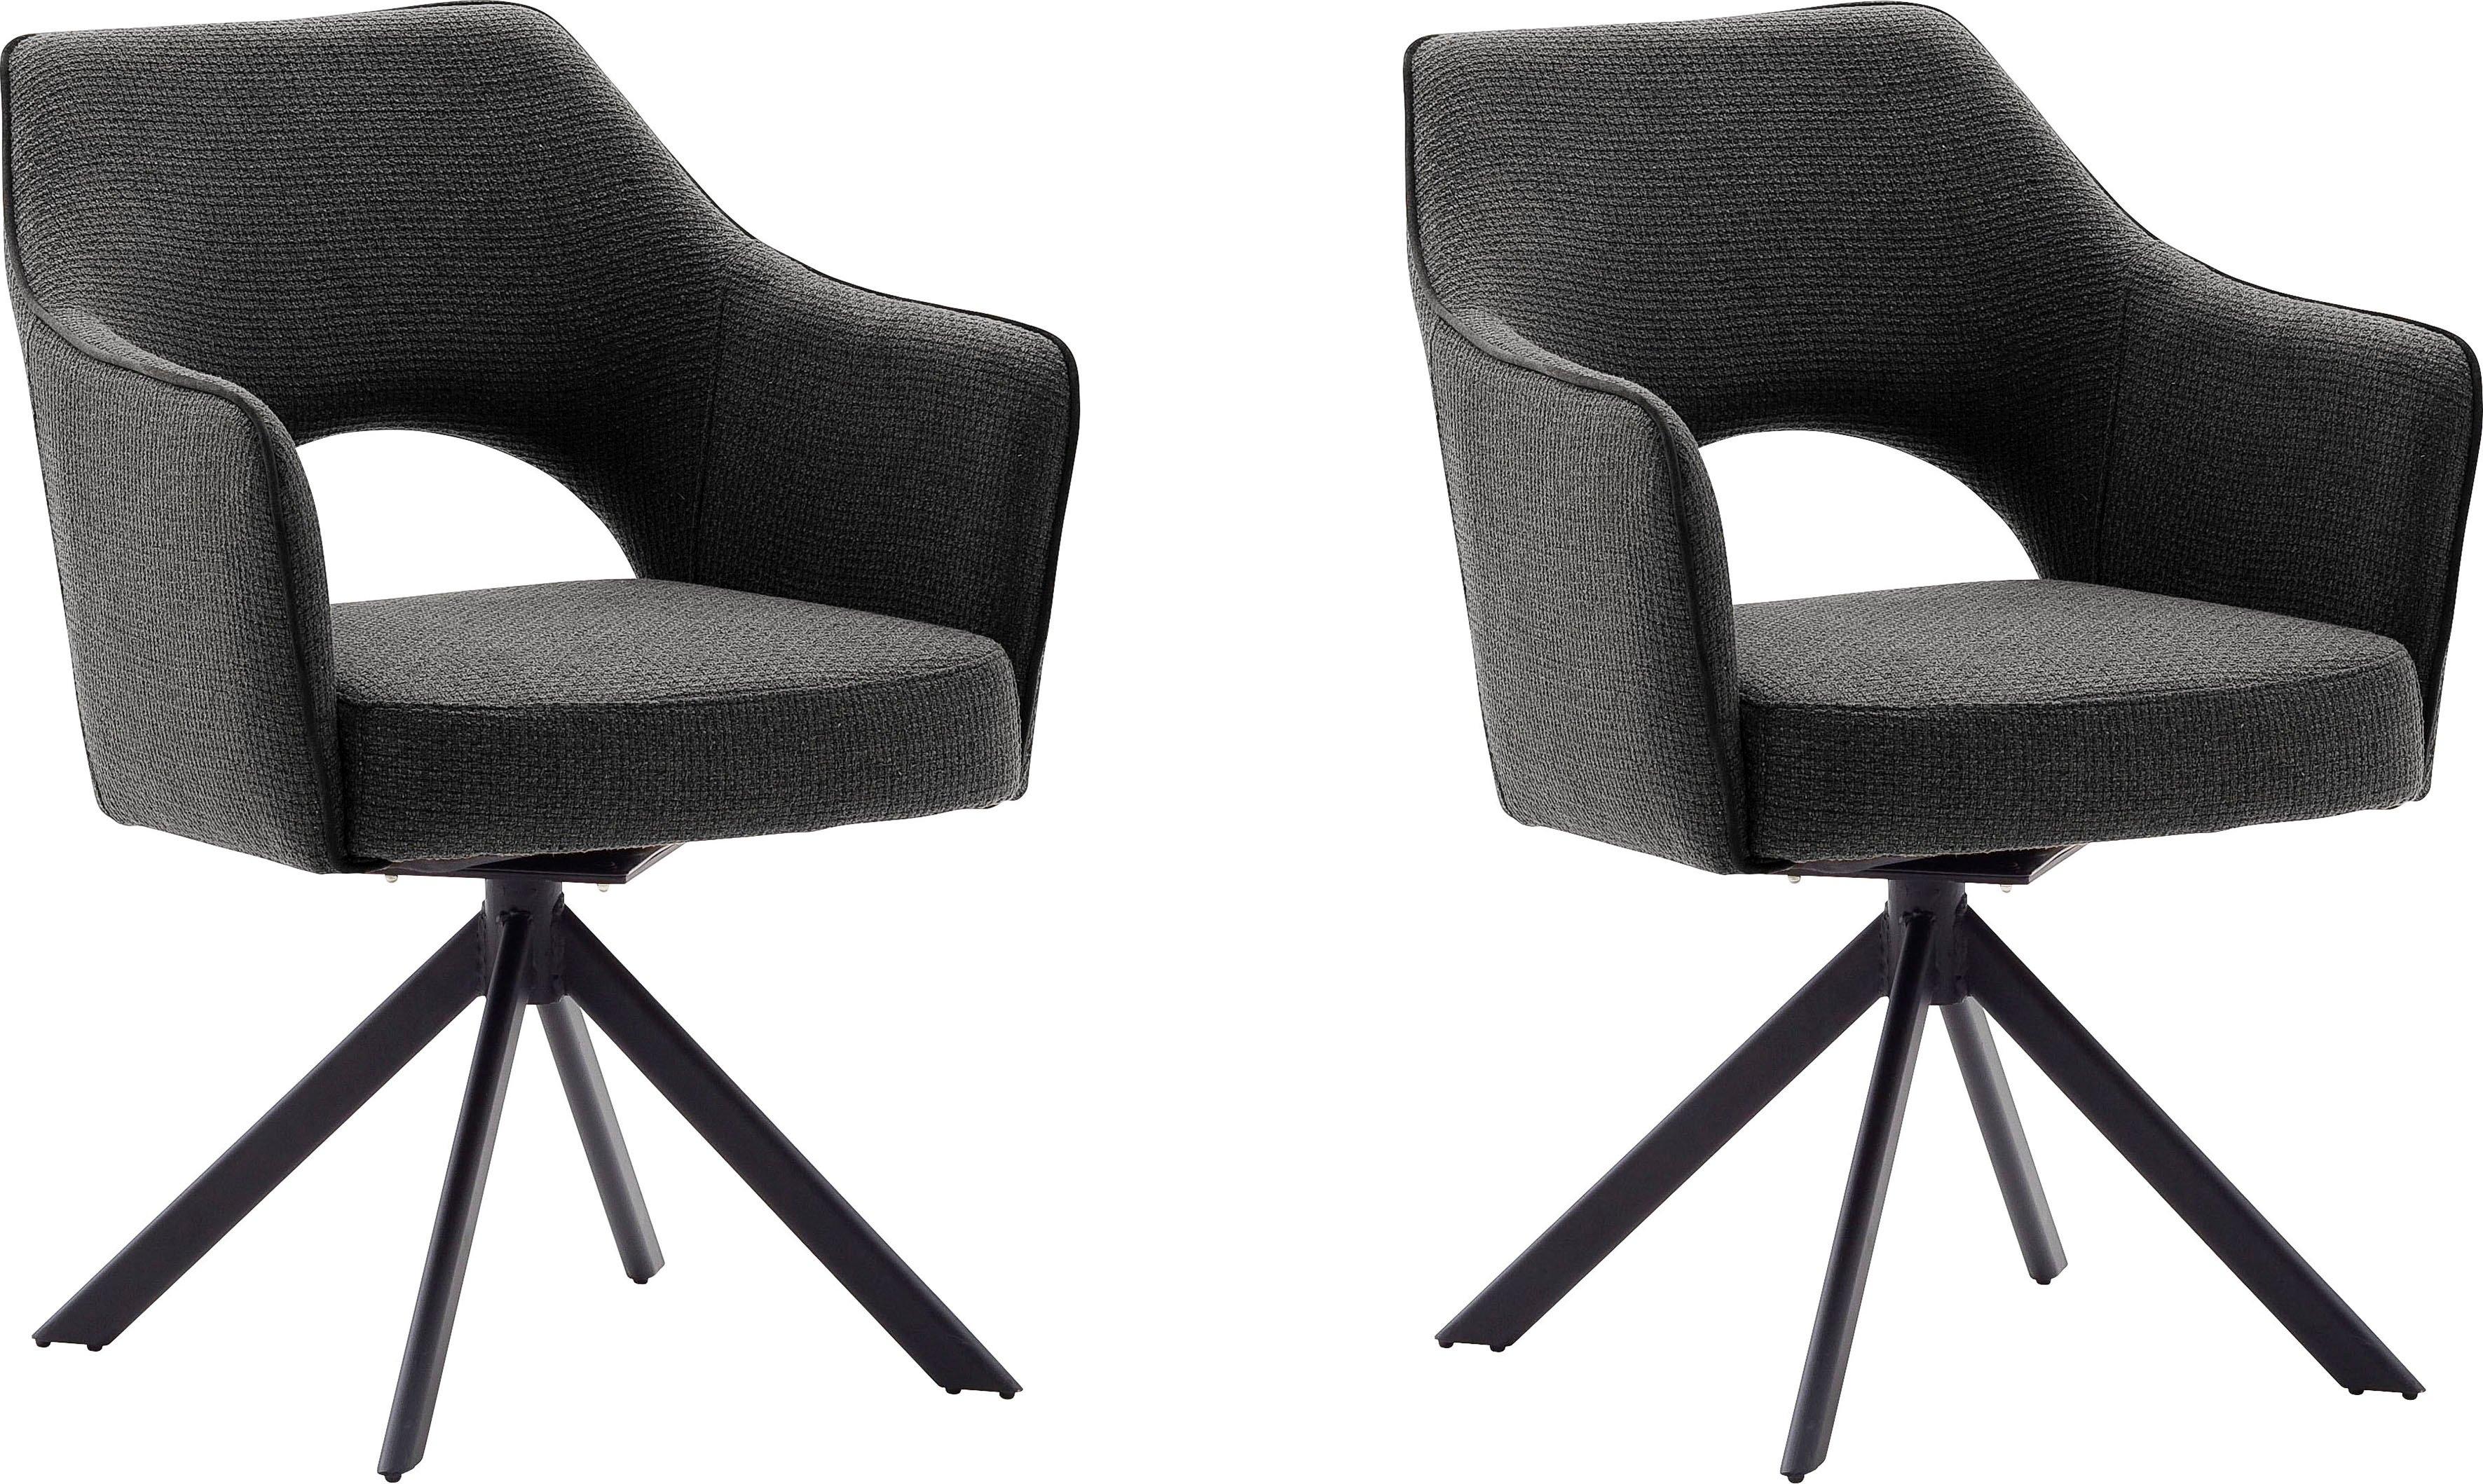 MCA furniture stoel Tonala (set, 2 stuks) goedkoop op otto.nl kopen